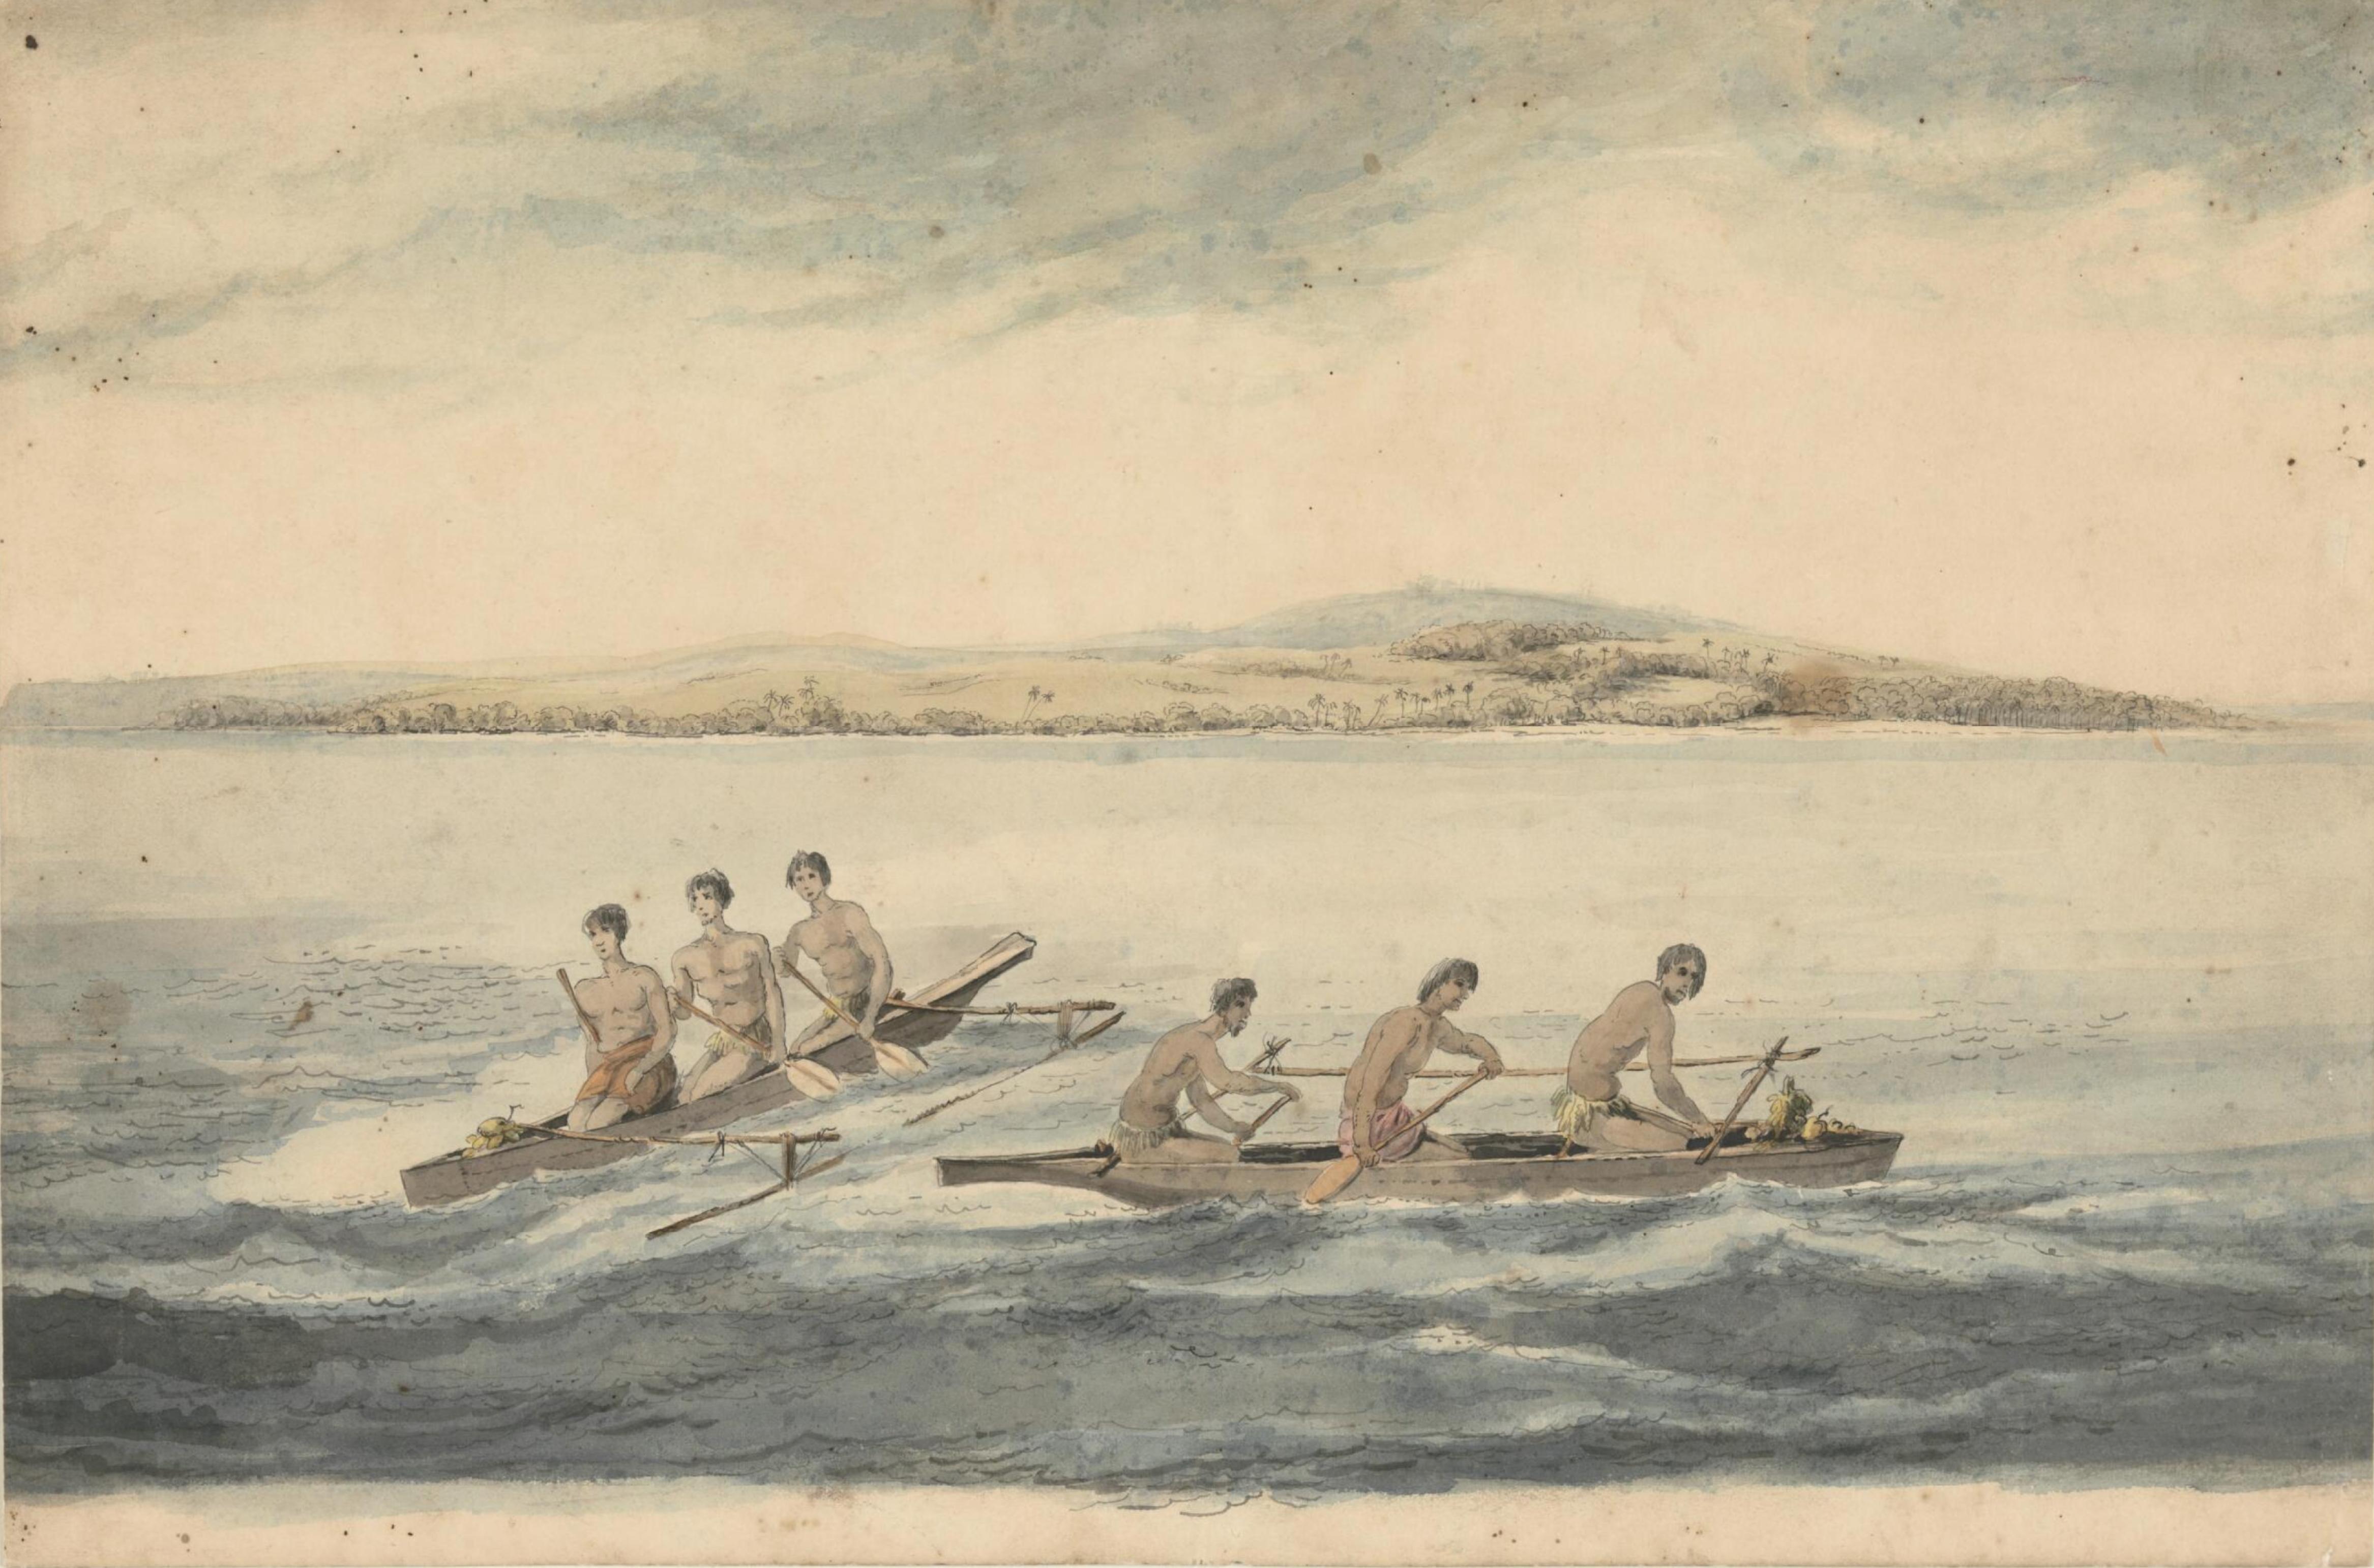 Canoes of the Friendly Islands, by John Webber